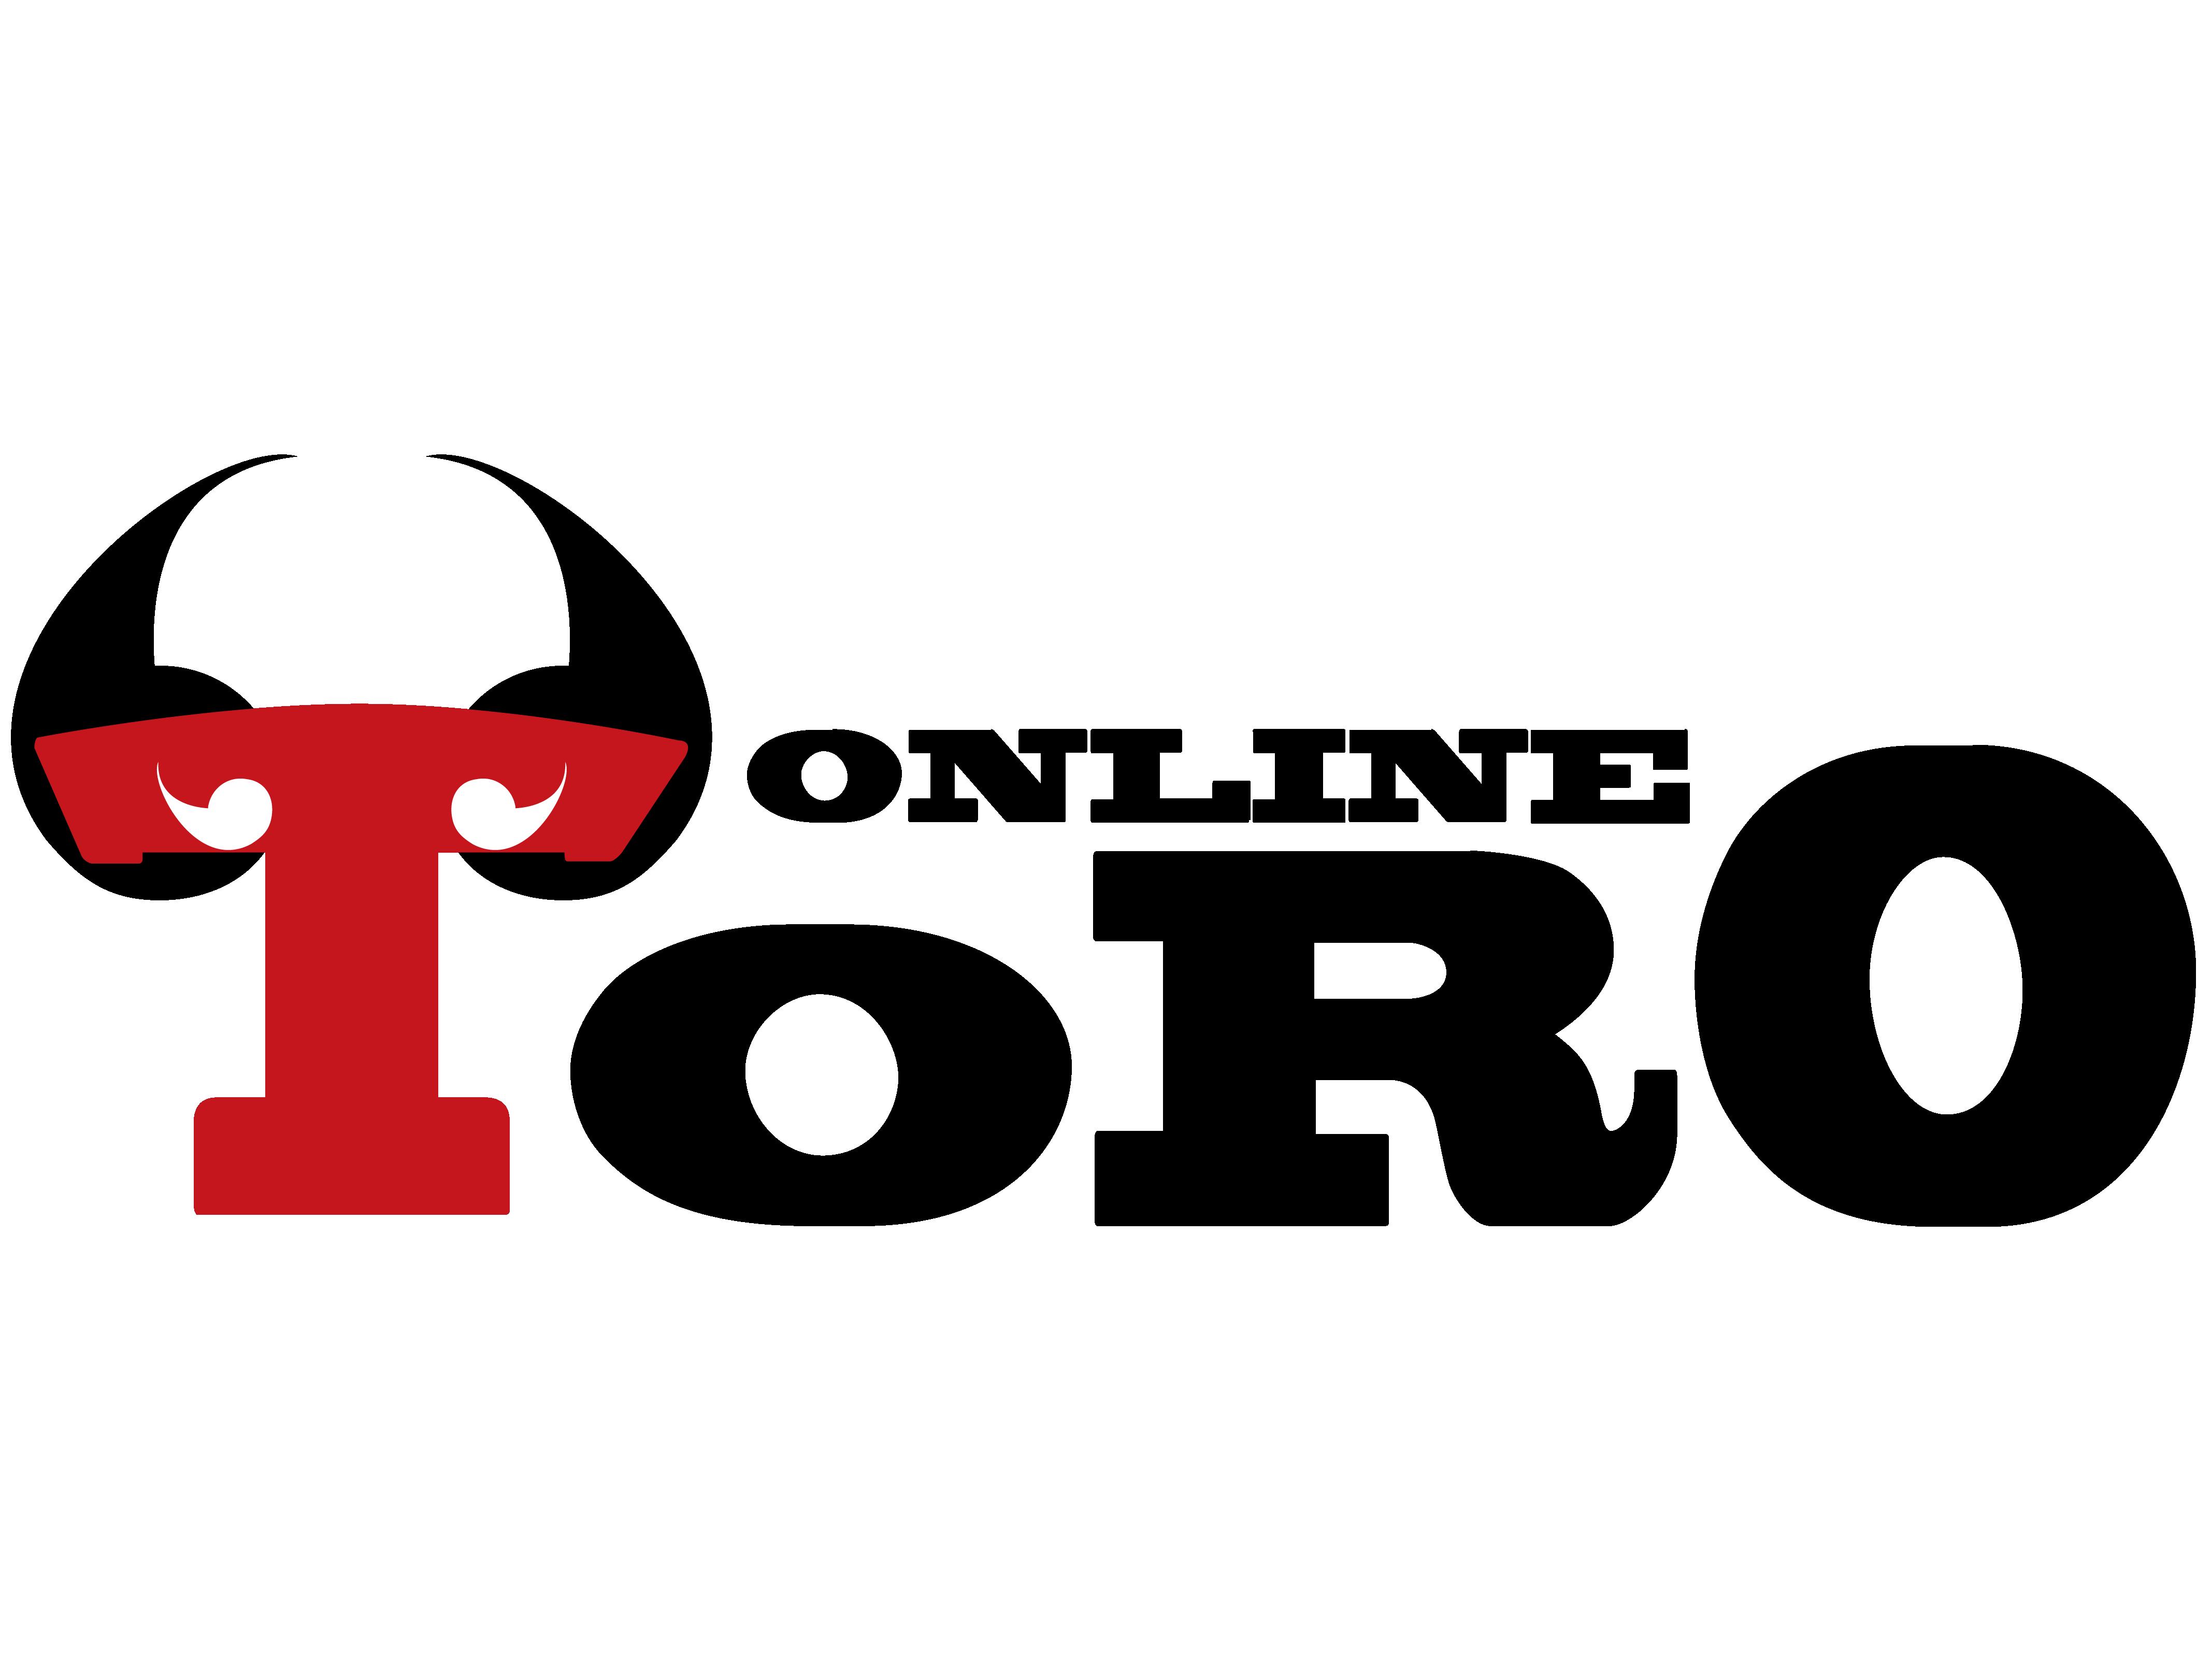 /images/com_odtatierkdunaju/teams/2020_ONLINE-TORO.png